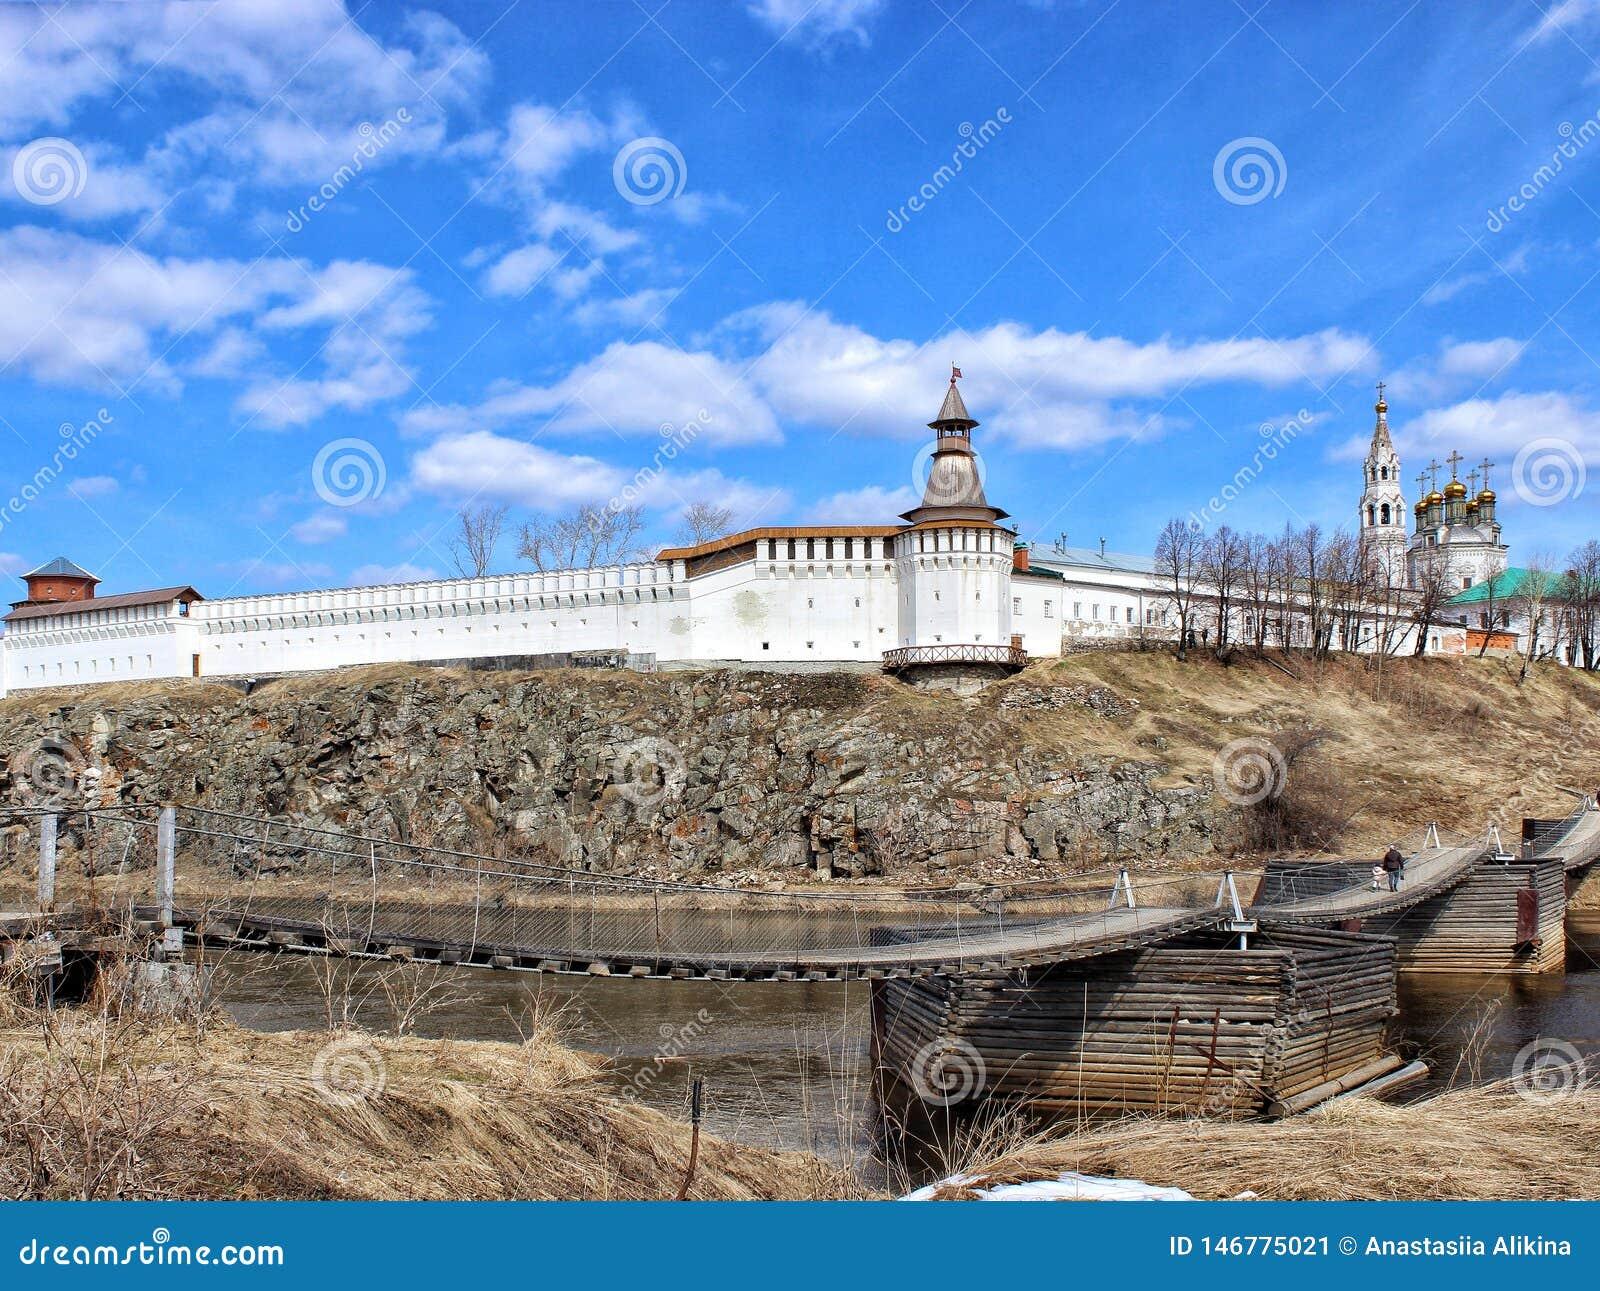 Verkhoturye kamień Kremlin Ural sprawy duchowe centrum Sverdlovsk region Rosja